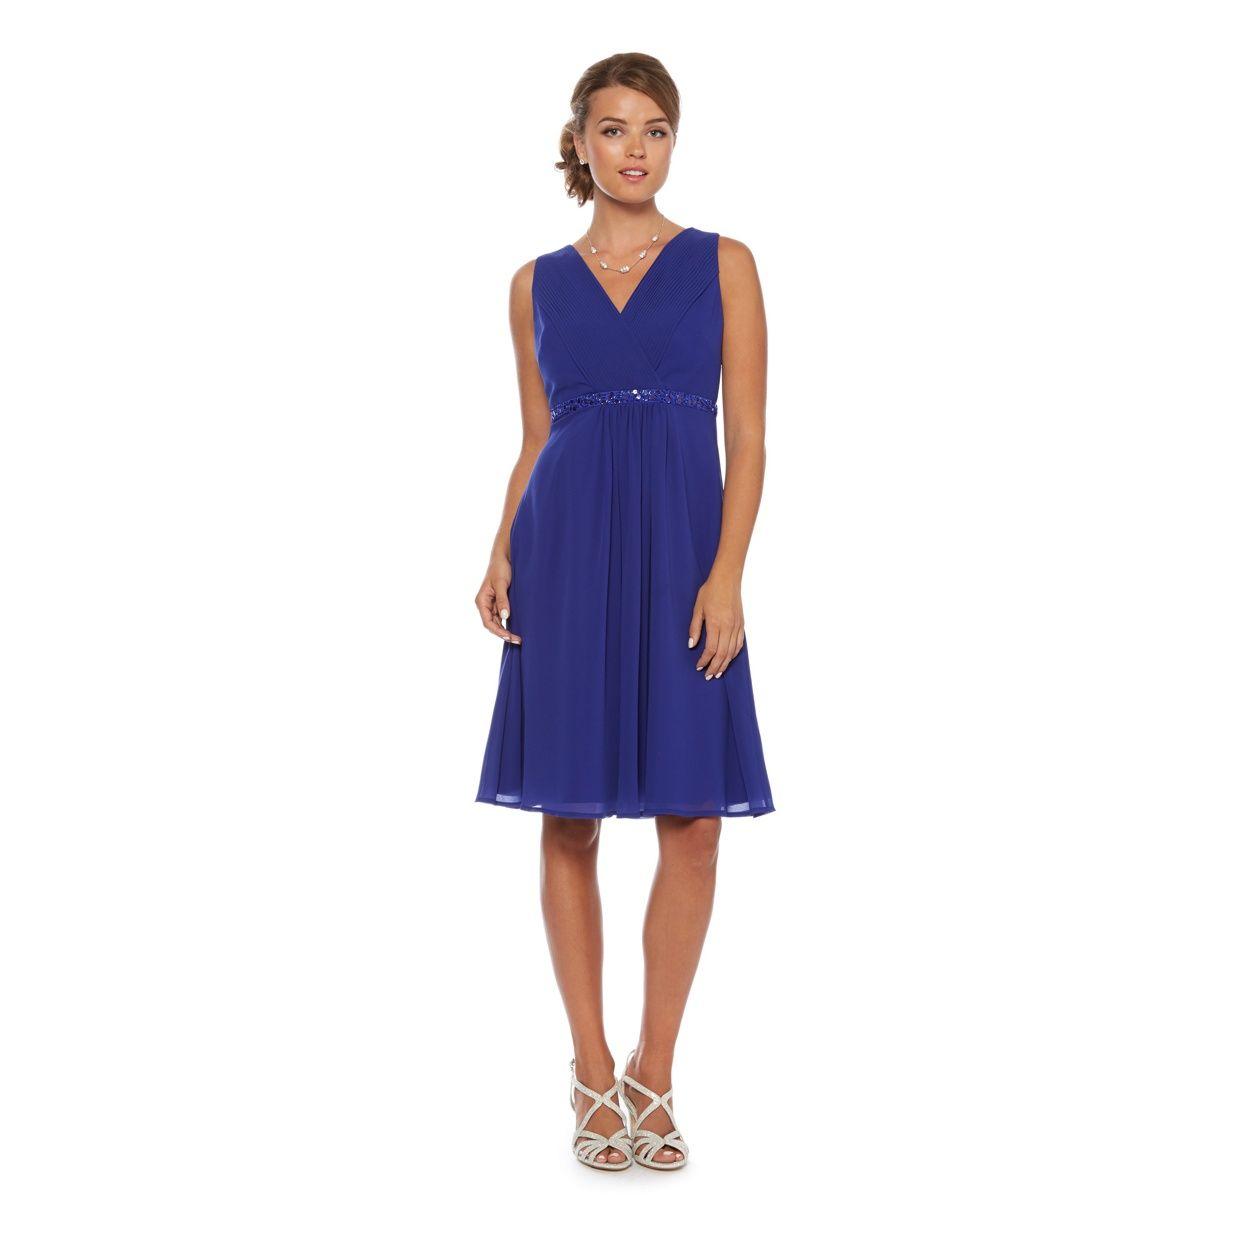 Debut cobalt blue jewel trim midi occasion dress at debenhams debut cobalt blue jewel trim midi occasion dress at debenhams blue bridesmaid dressesbridesmaid ombrellifo Choice Image